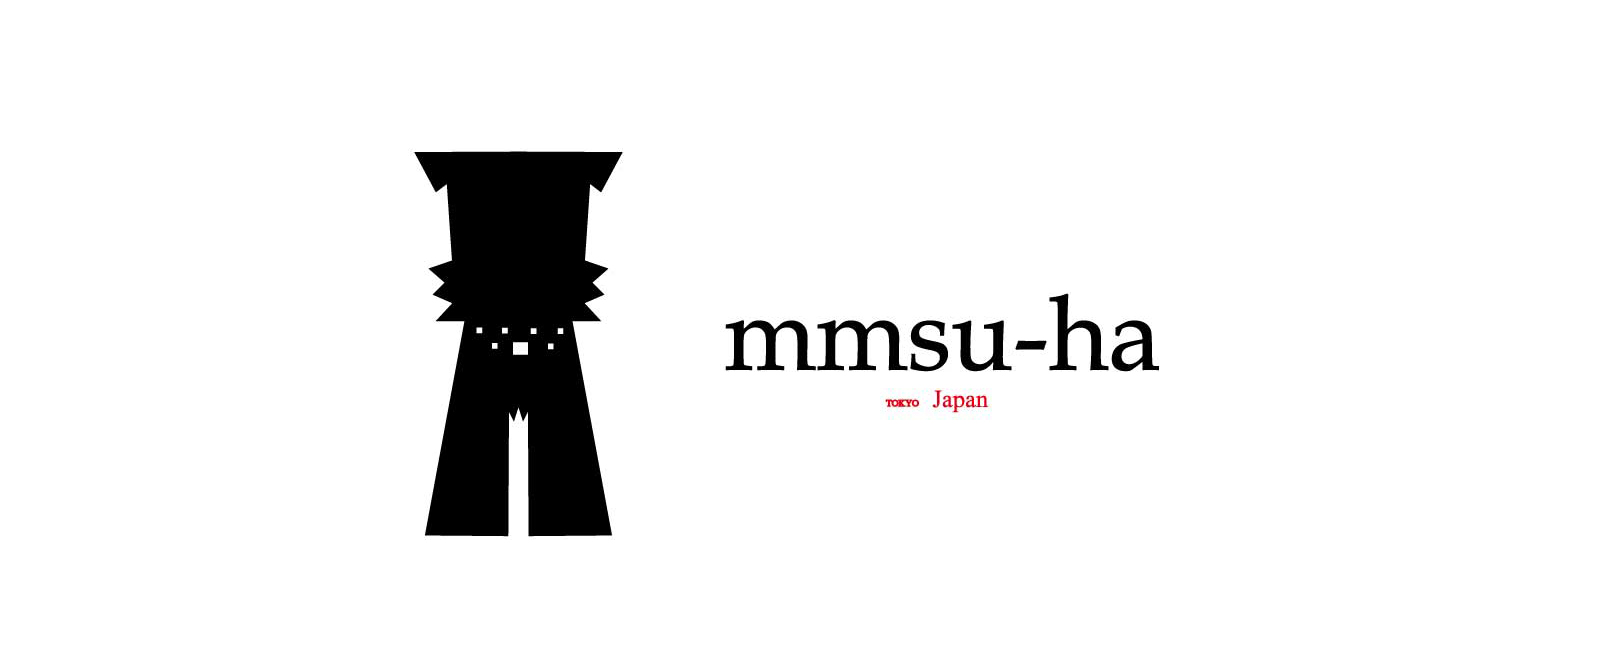 mmsu-ha全商品紹介